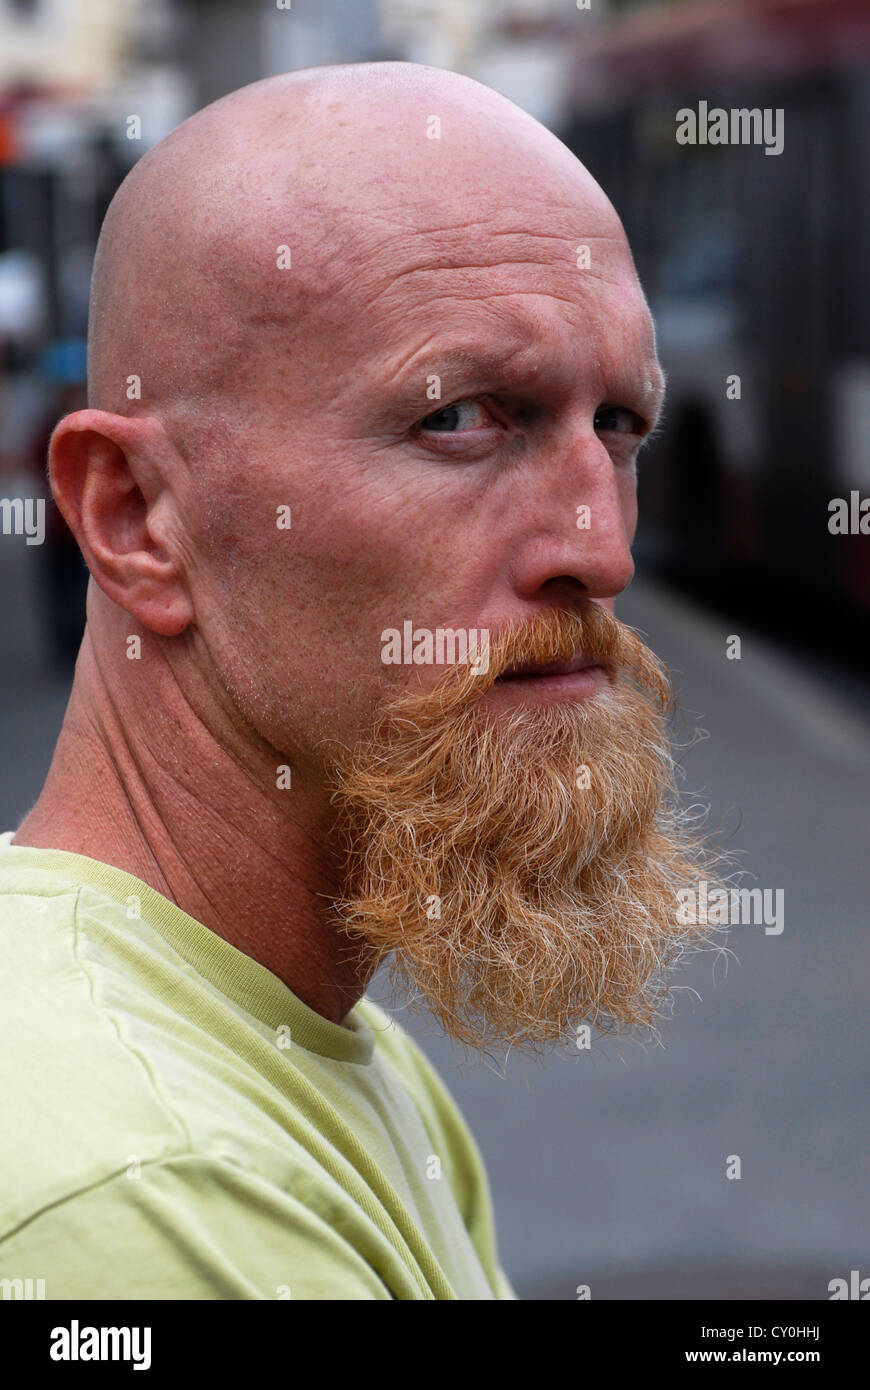 Moustache, Personage, Man, Salzburg,  Austria,  Europe - Stock Image